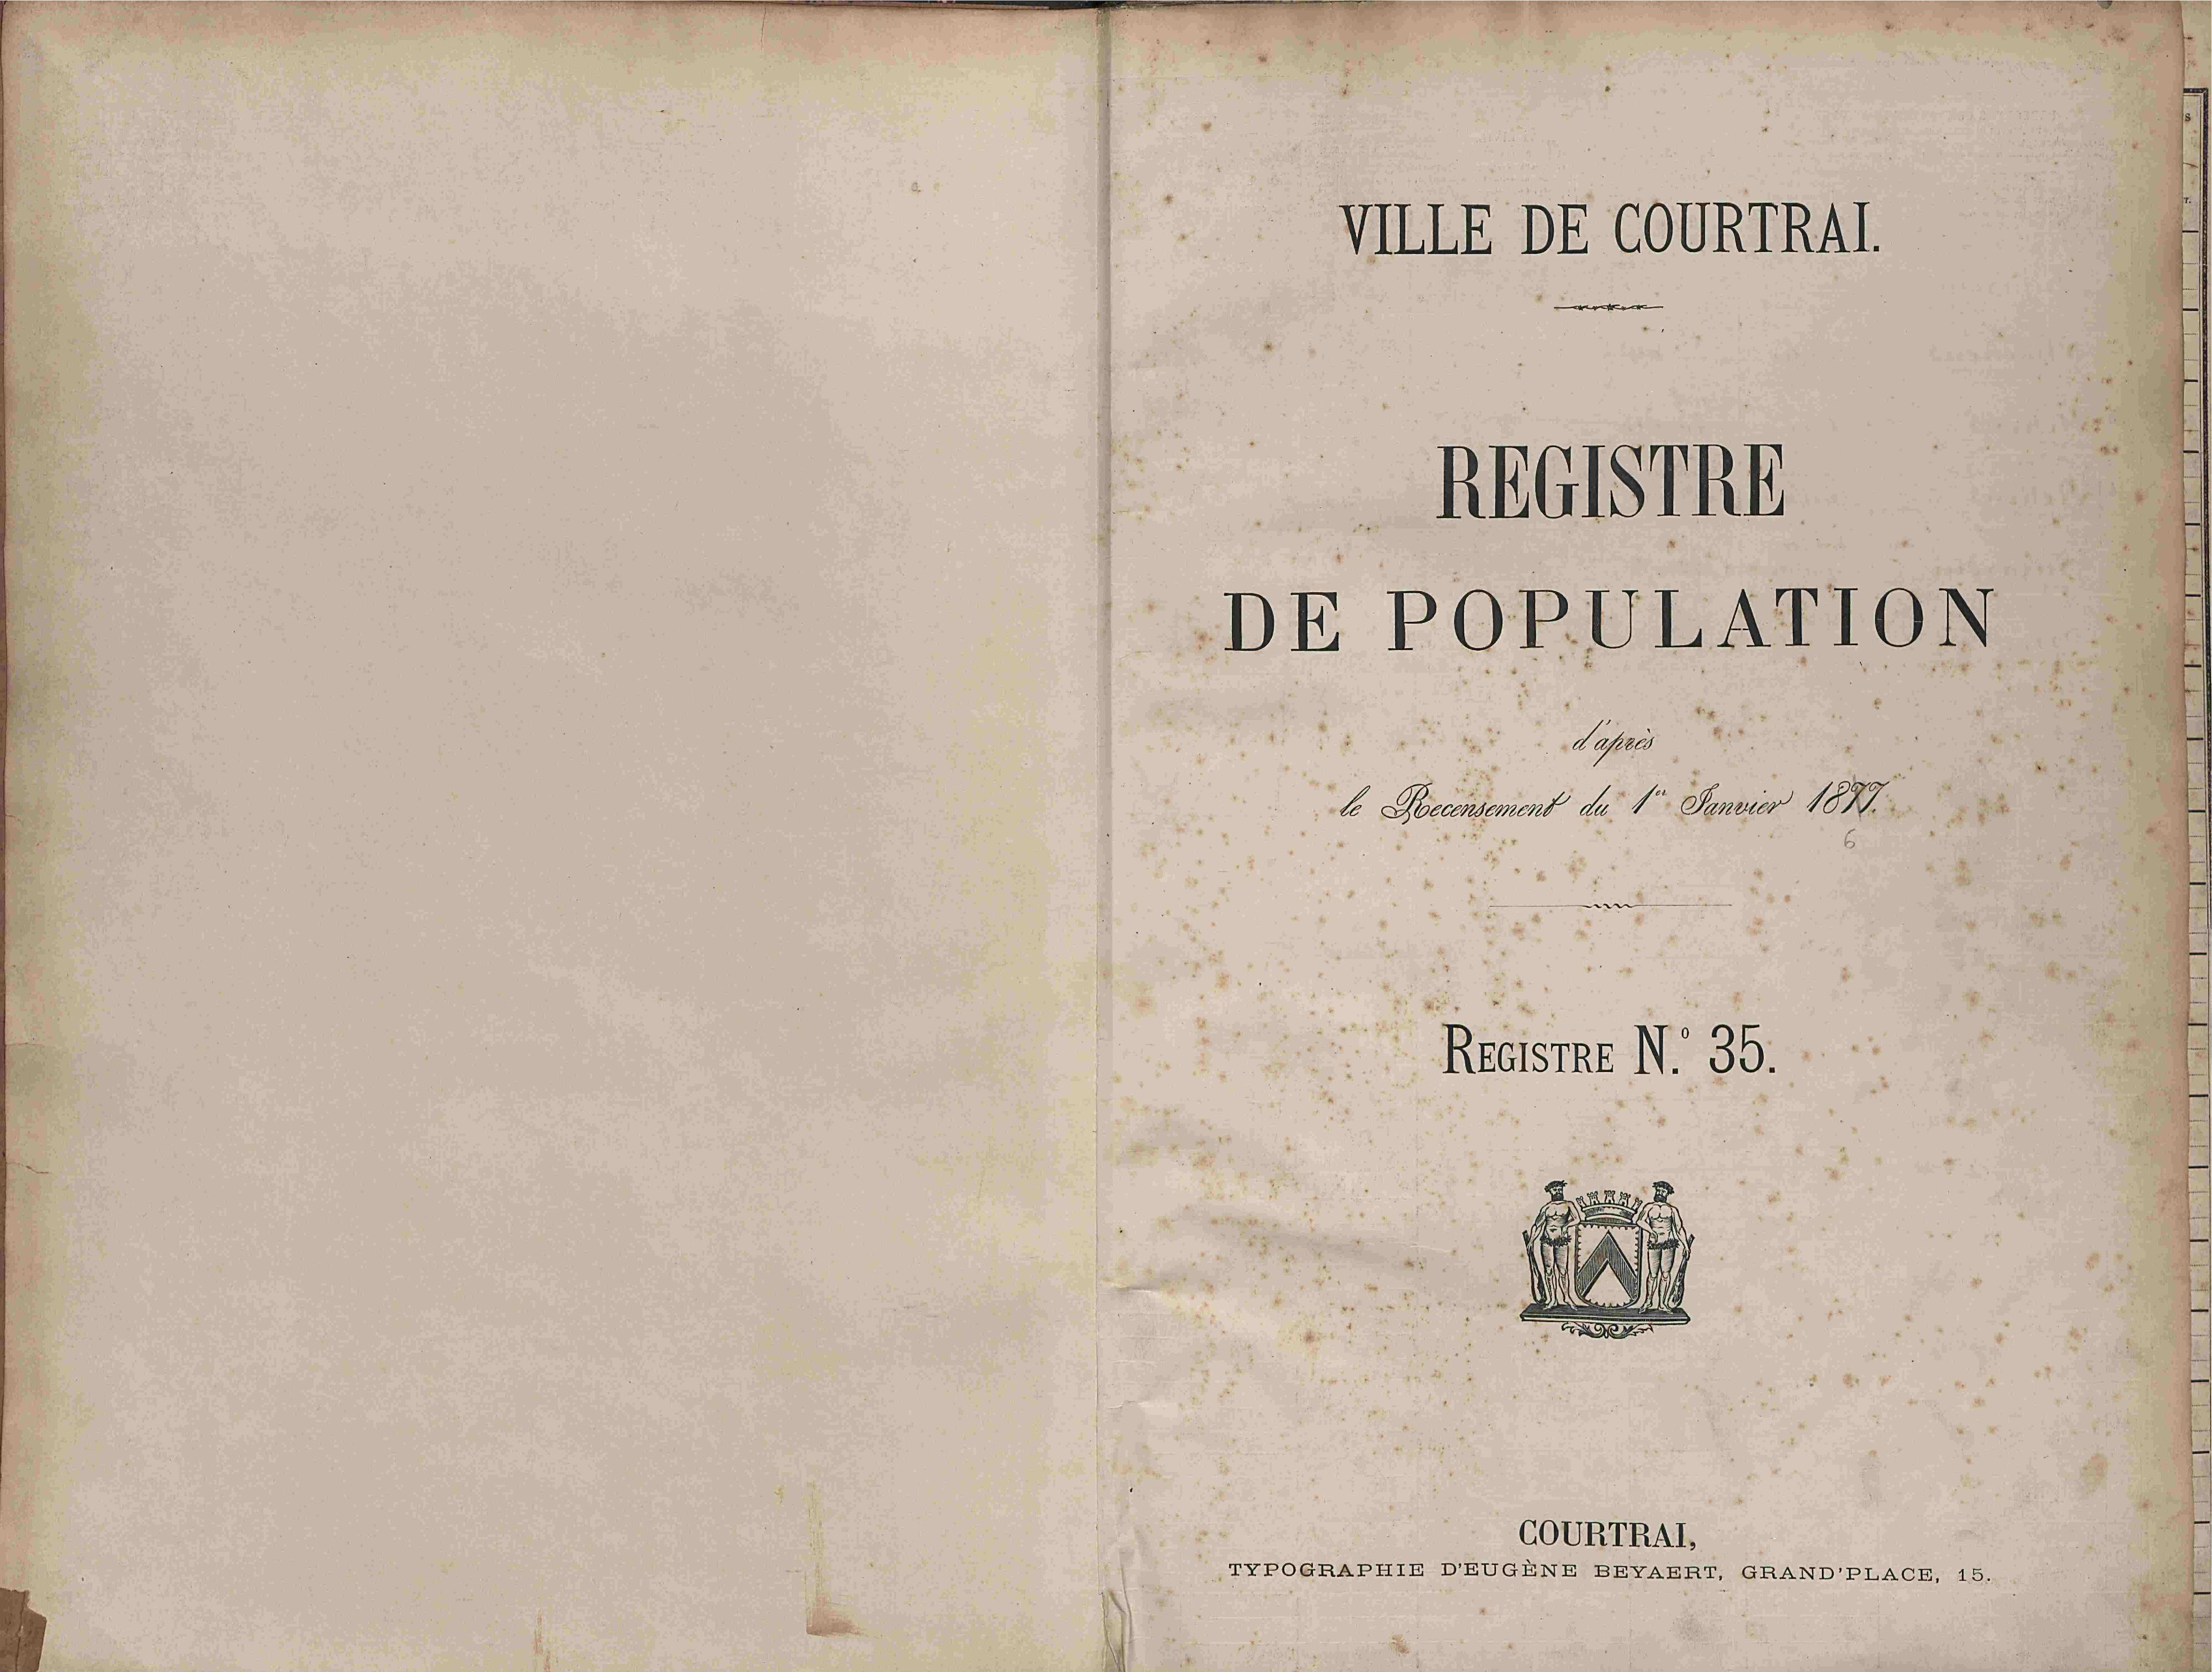 Bevolkingsregister Kortrijk 1866 boek 35